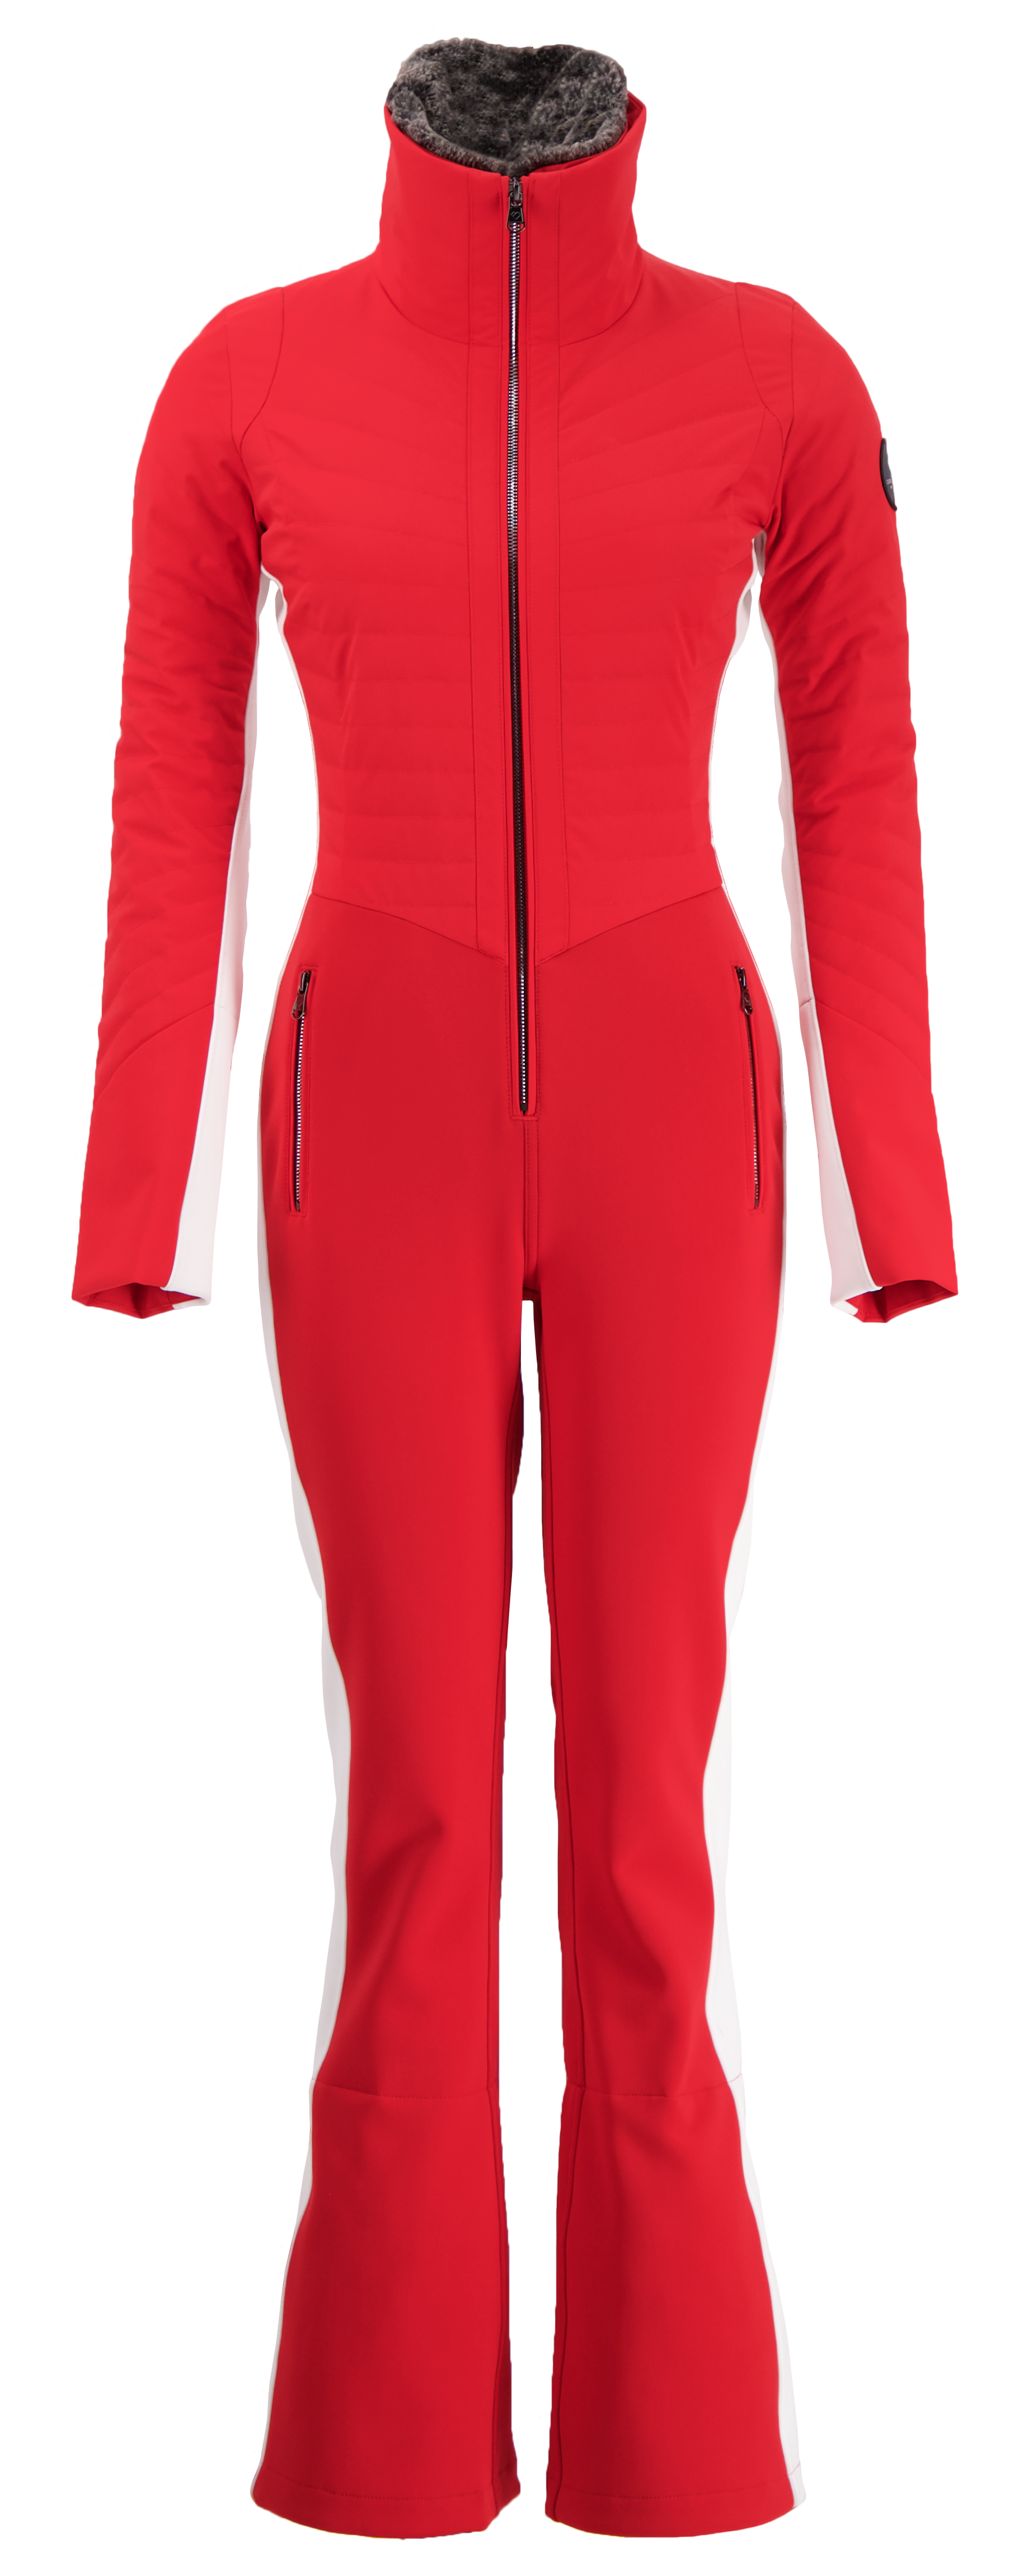 Arc'teryx Kappa AR jacket